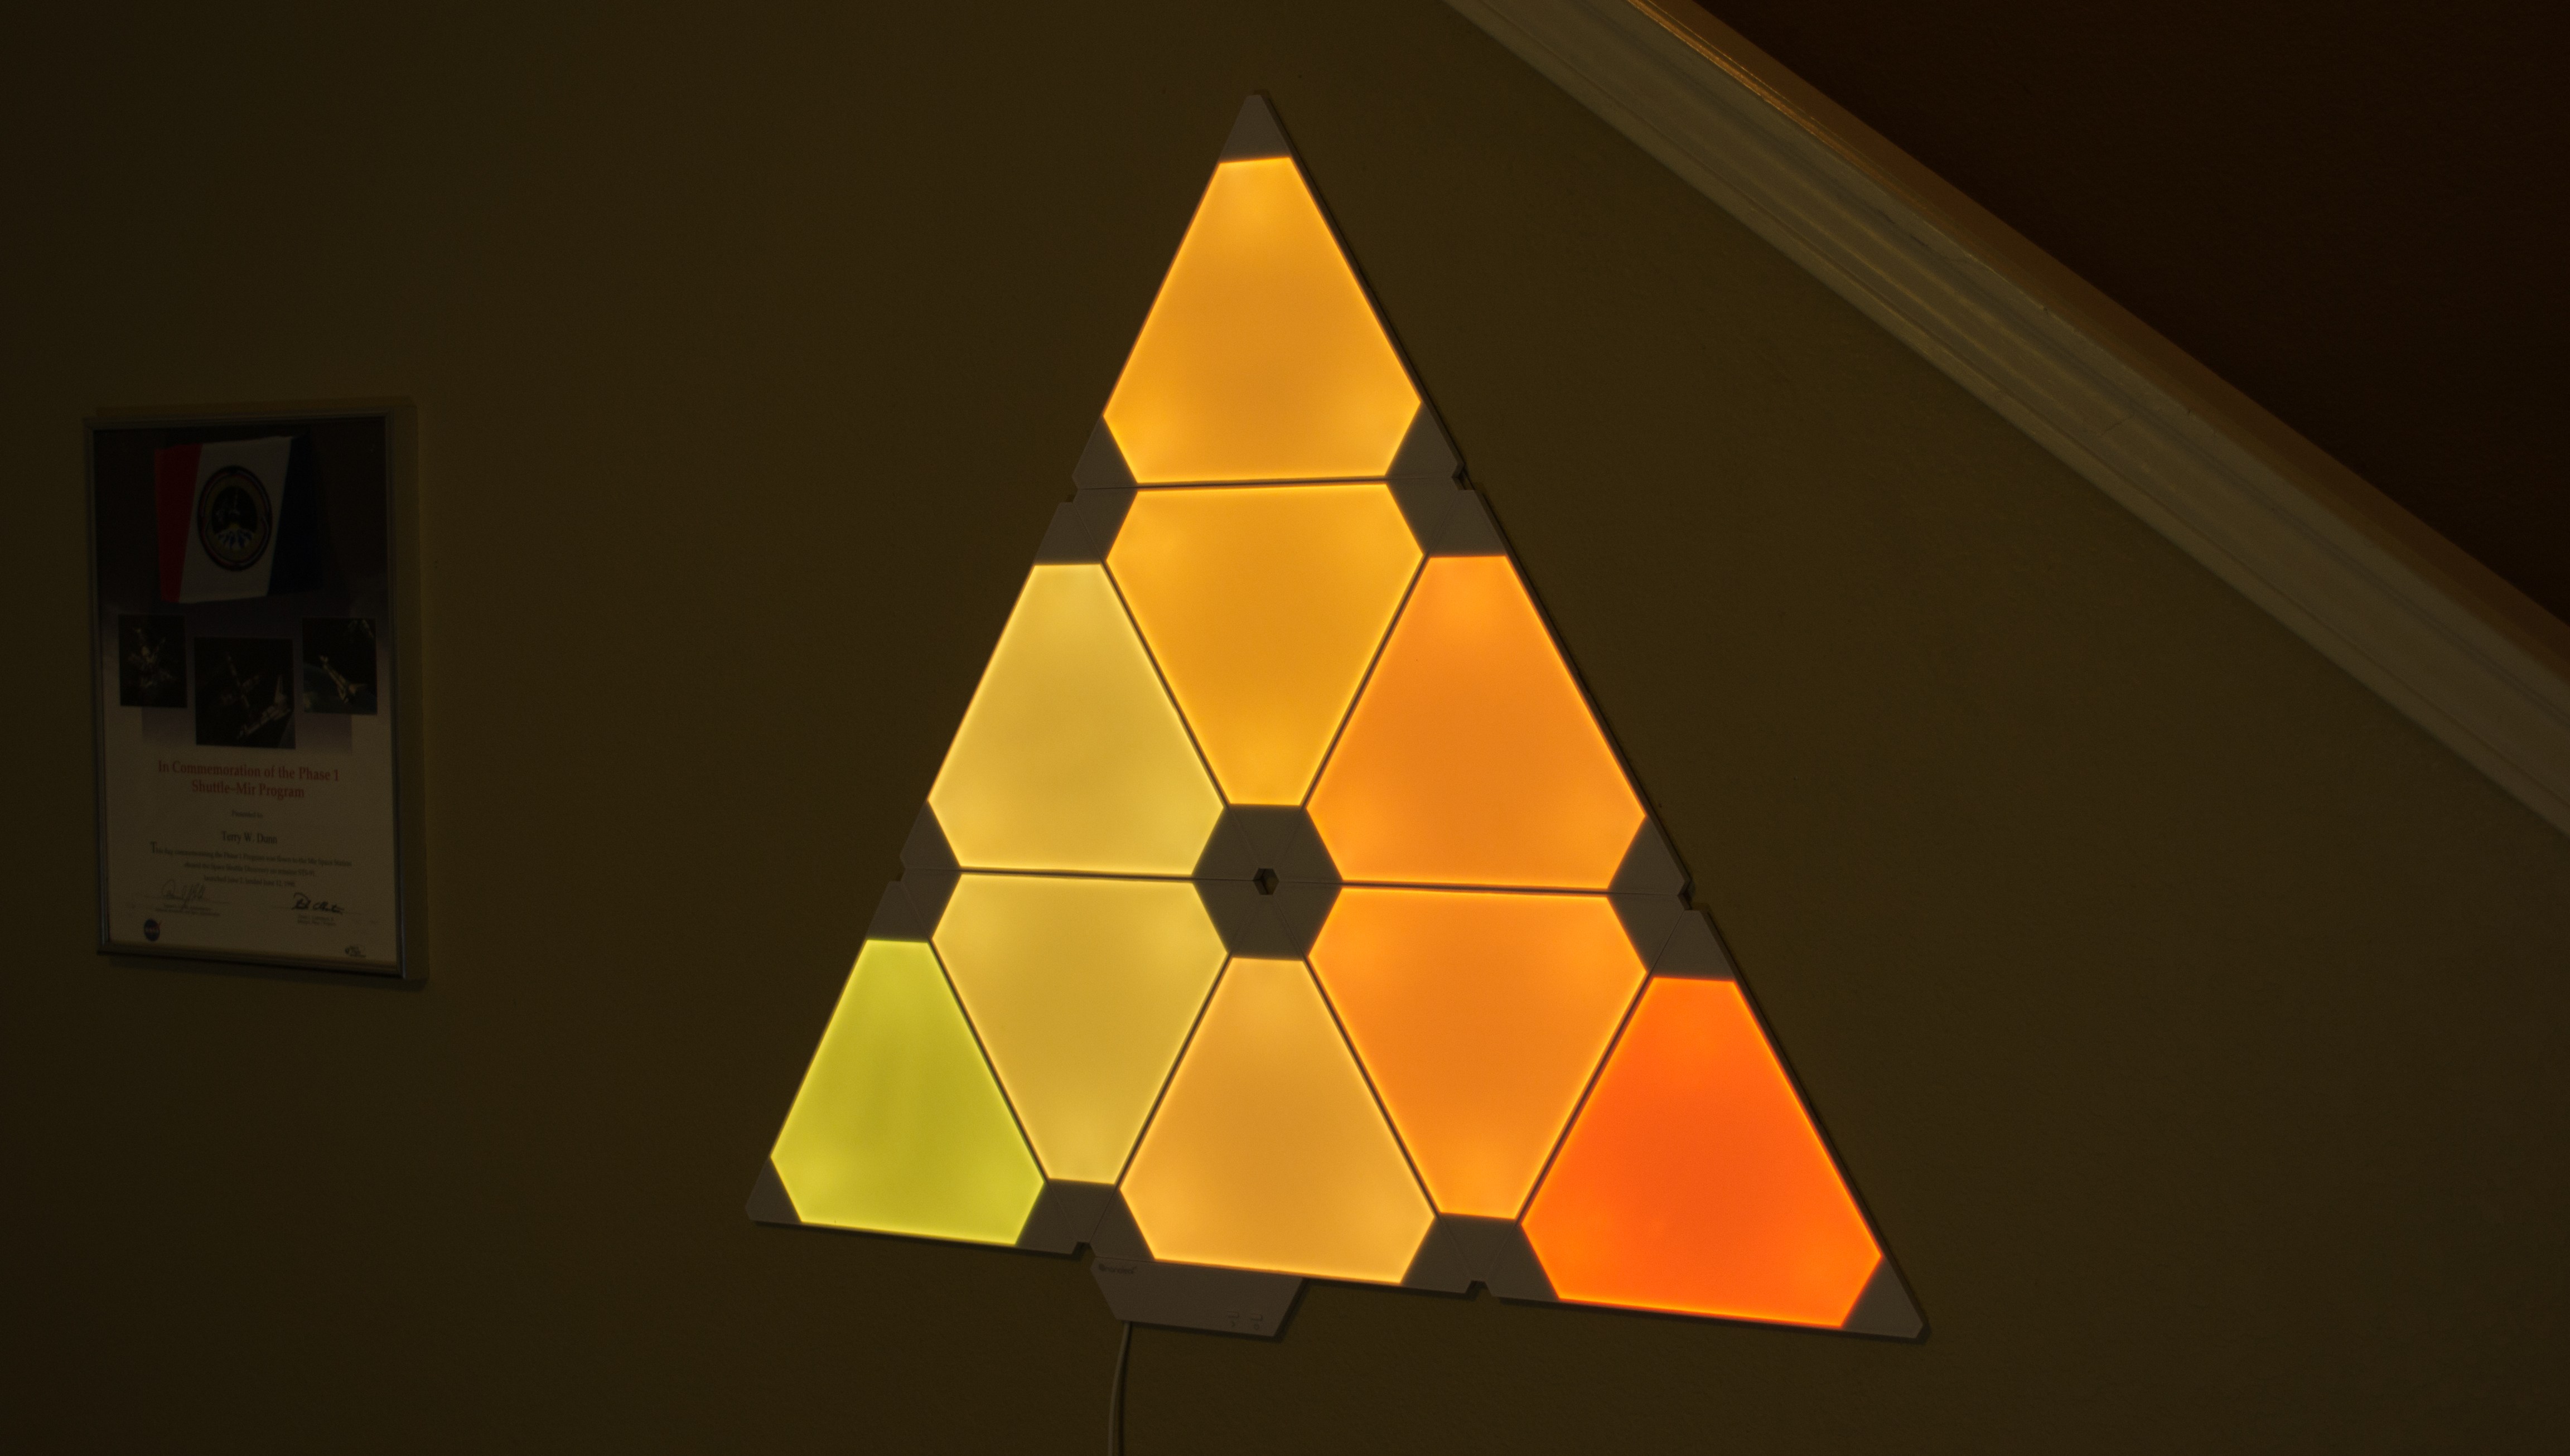 Enlarge / The Aurora lights in action. & Smart art: The Nanoleaf Aurora triangular lighting system is really ...